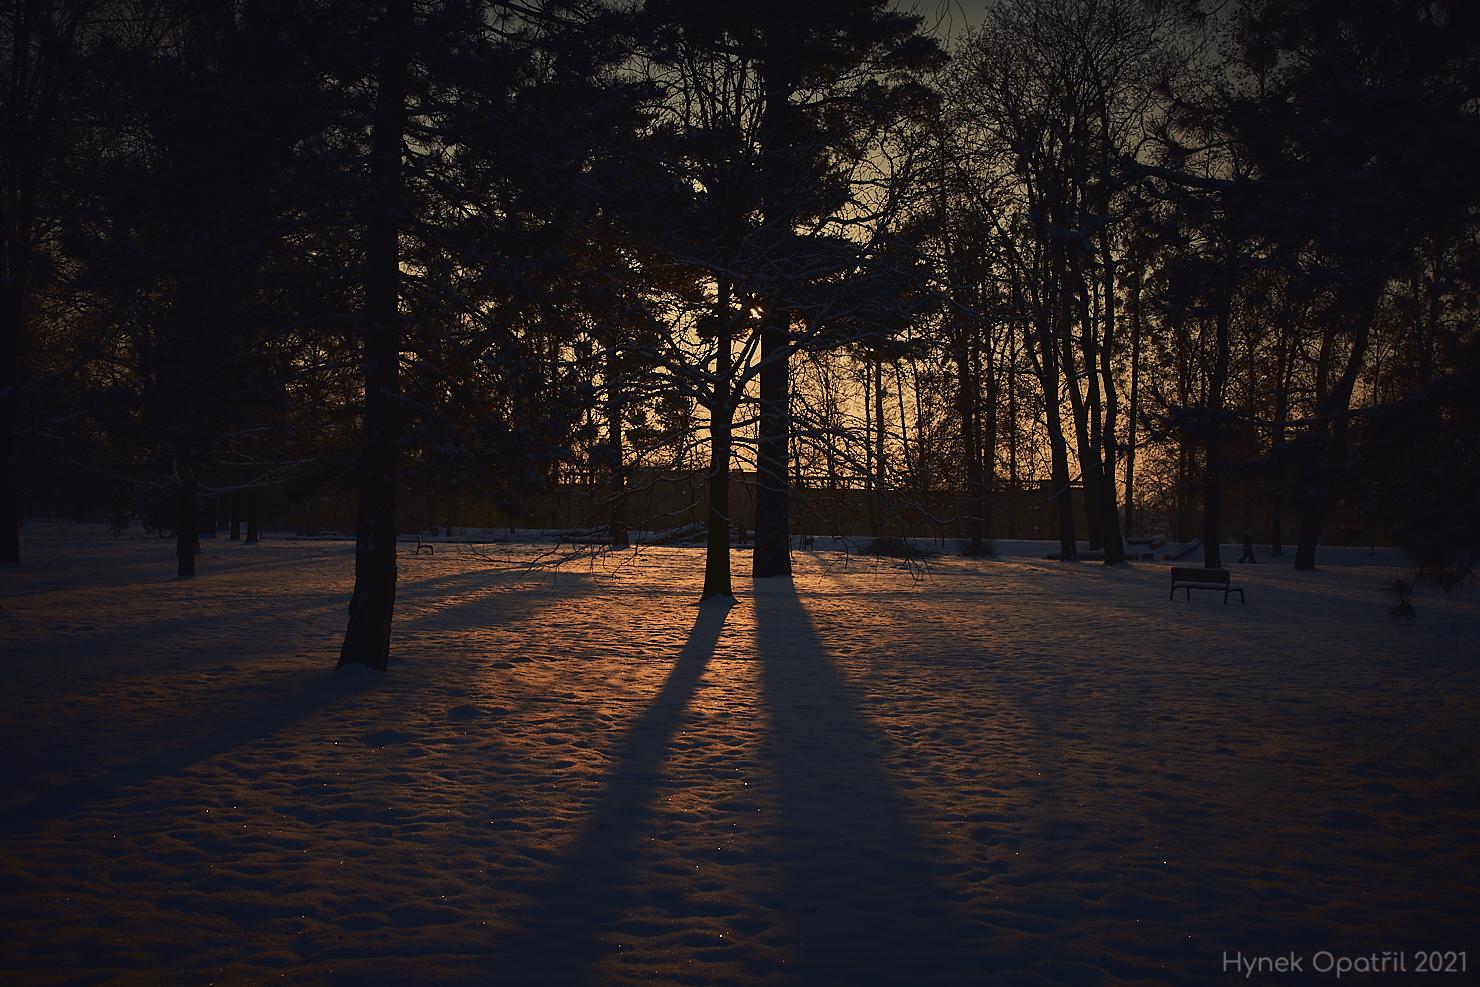 Fotoobraz park Hynek Opatřil